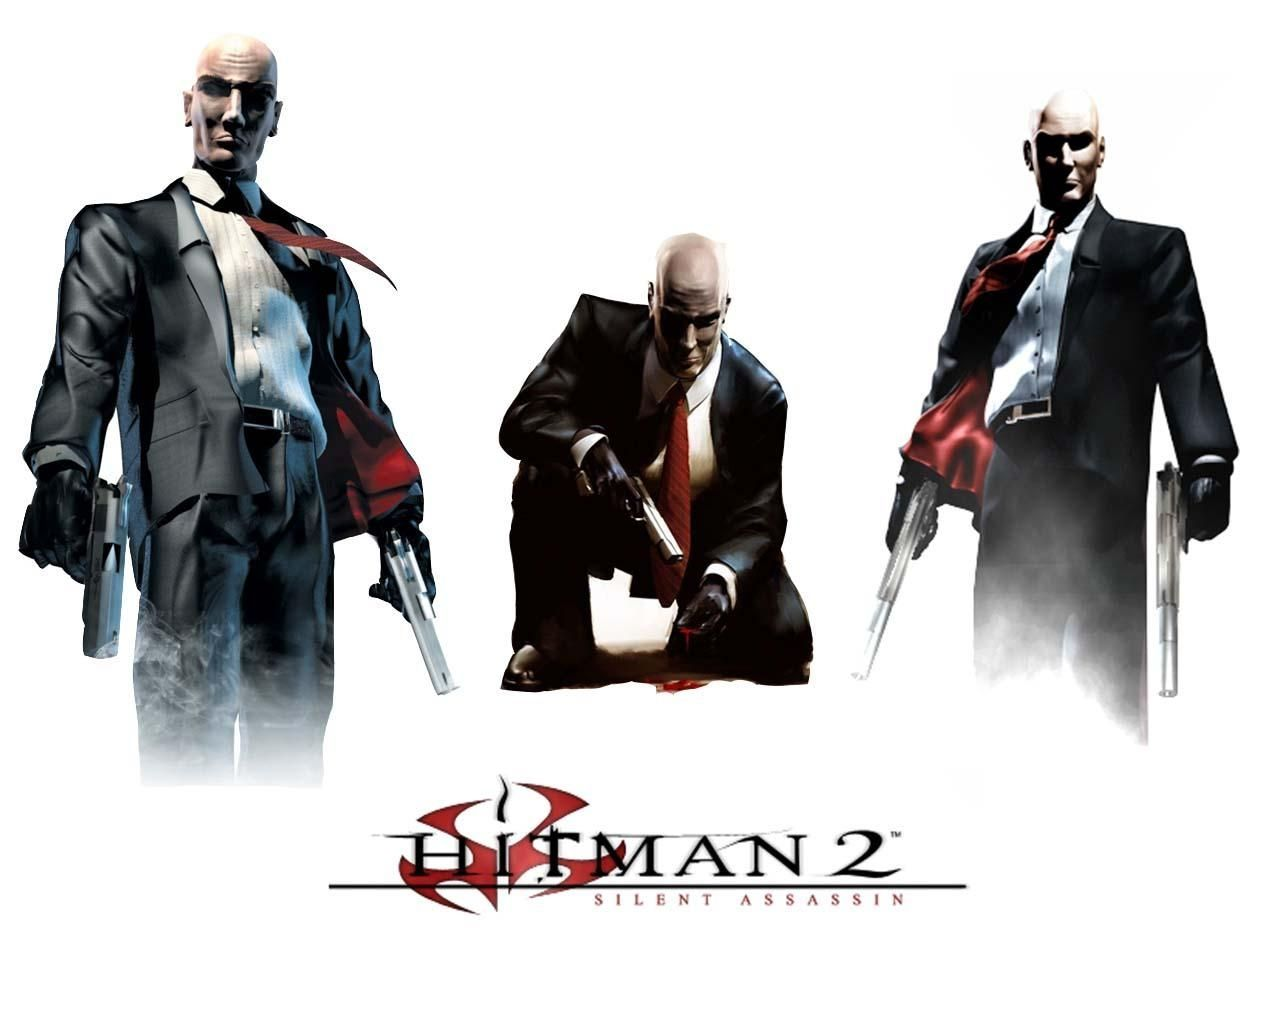 hitman 2 silent assassin xbox 360